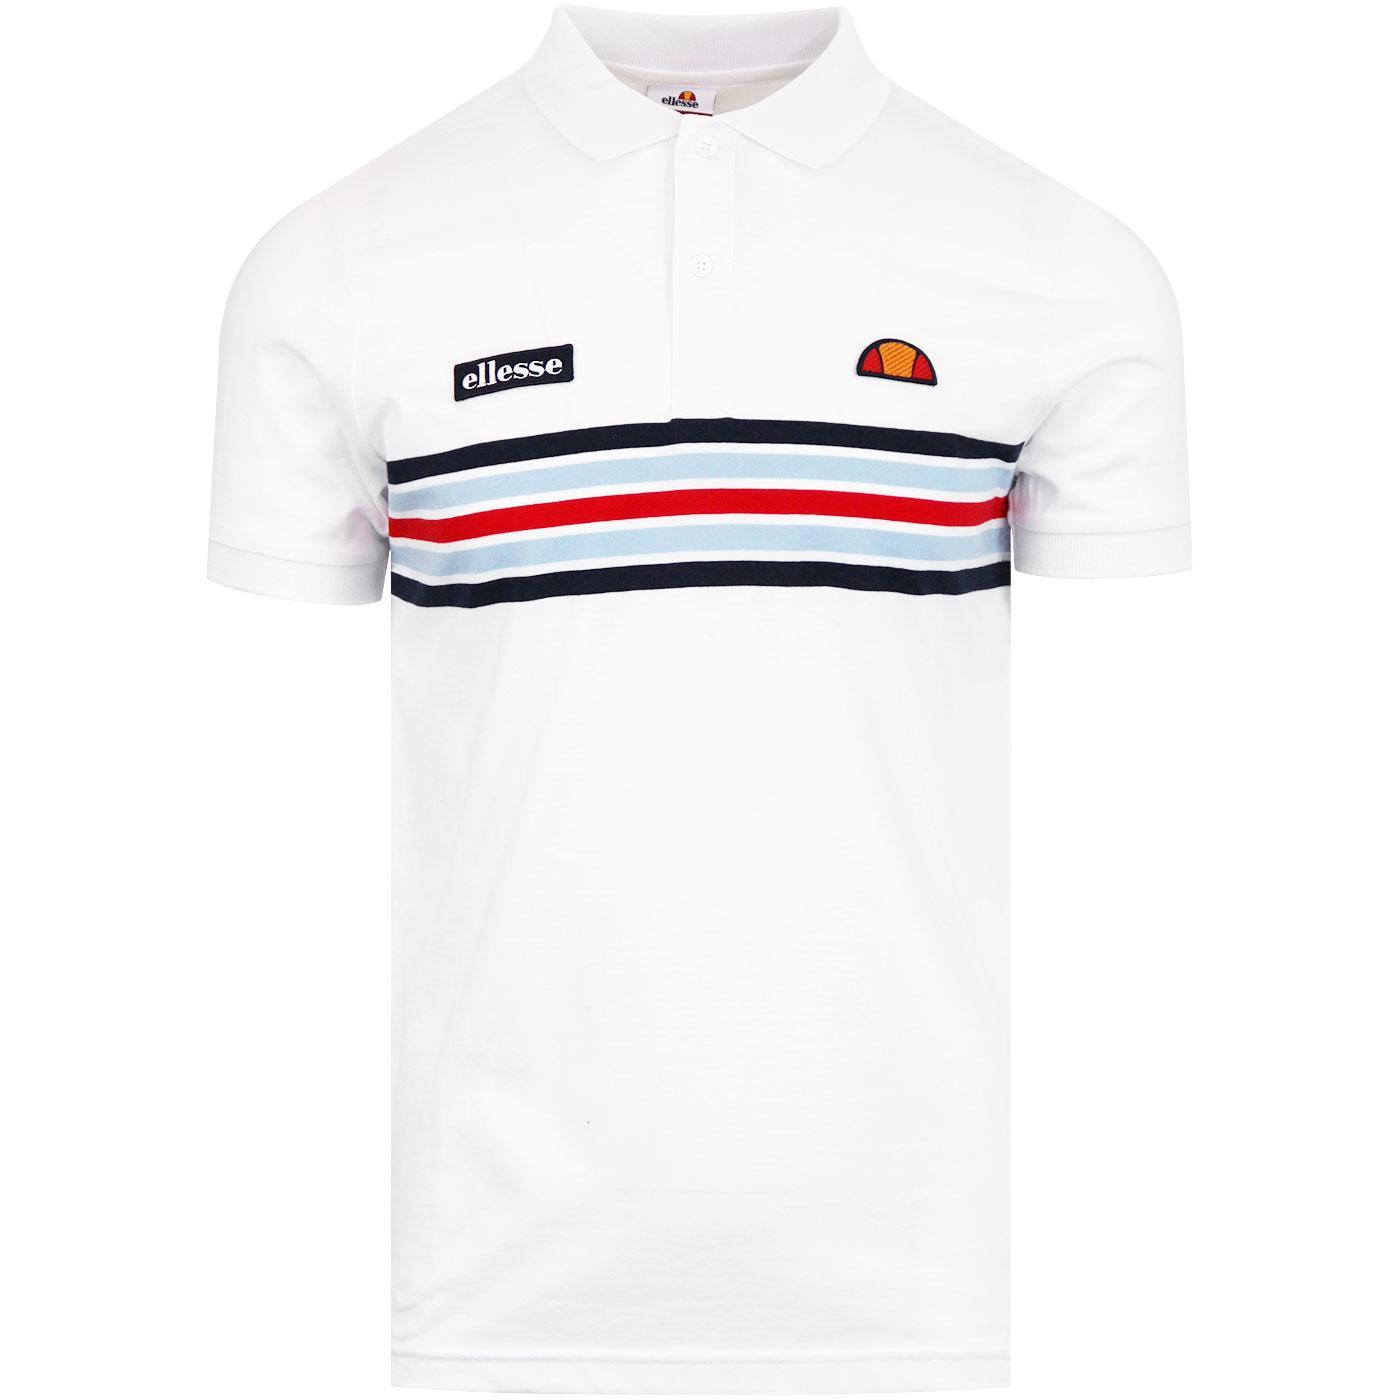 Pesaro ELLESSE Retro Indie Chest Stripe Polo Shirt